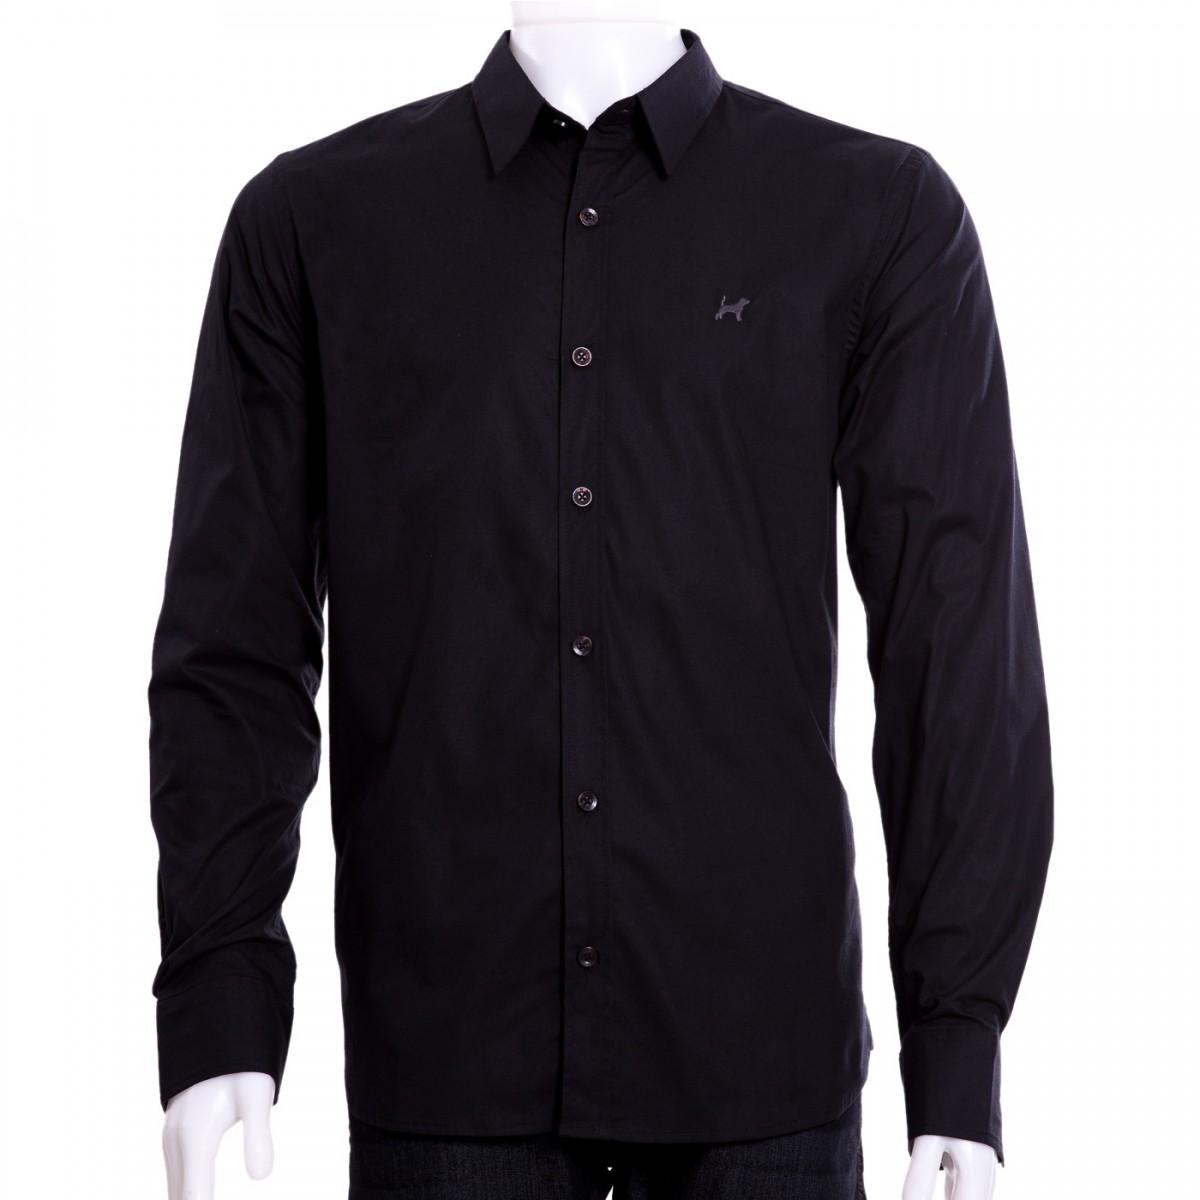 954f3d85b0 Bizz Store - Camisa Social Masculina Beagle Manga Longa Preto Azul